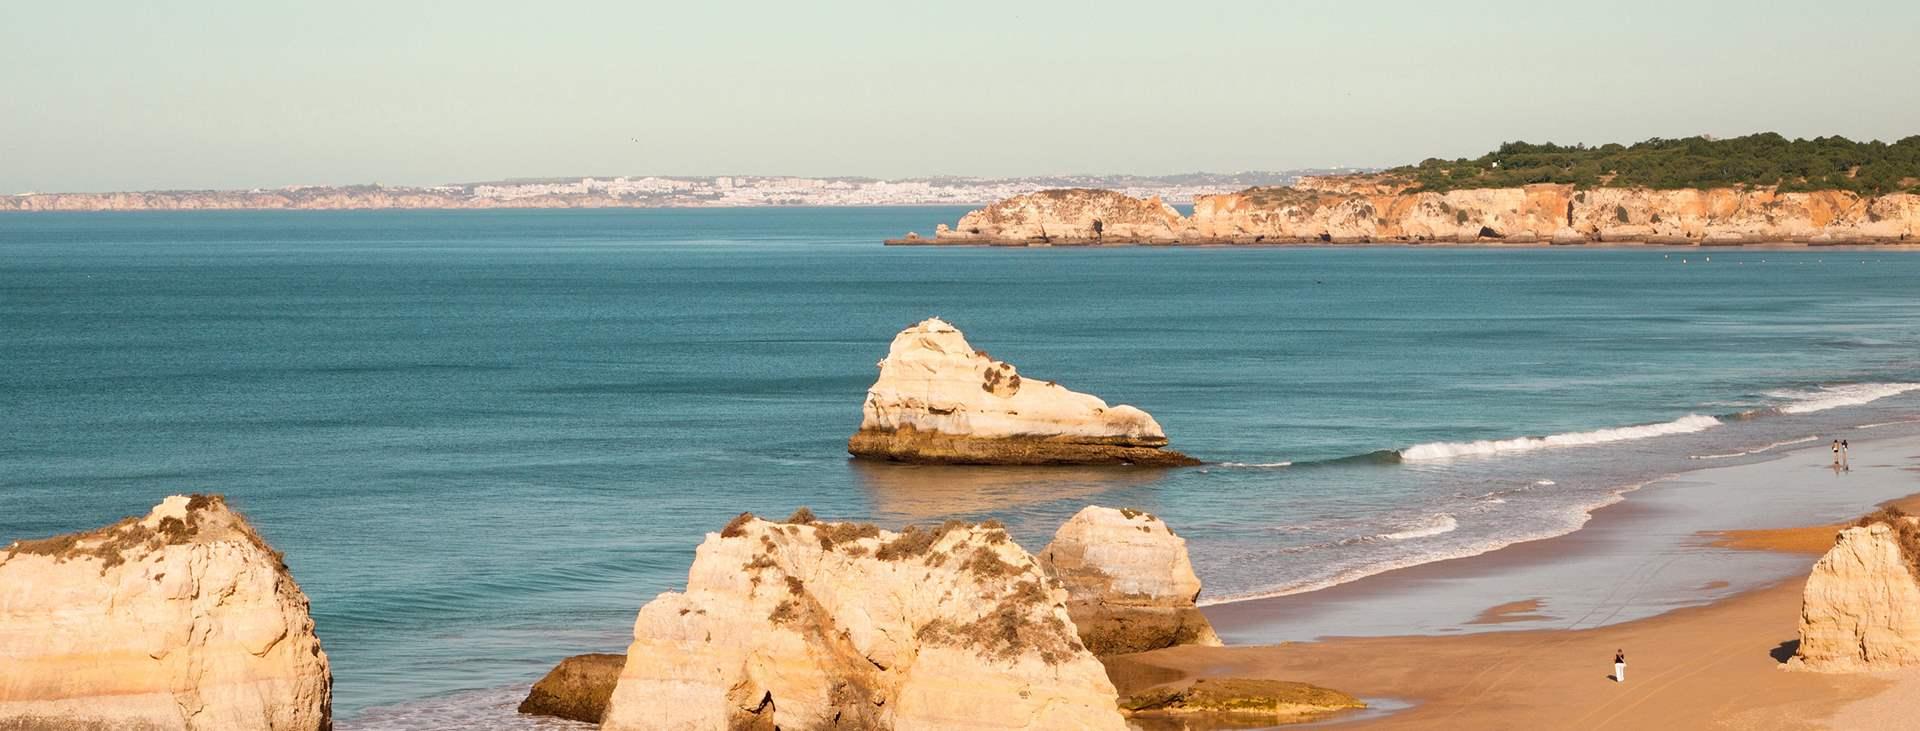 Boka din resa till Algarve i Portugal med Ving